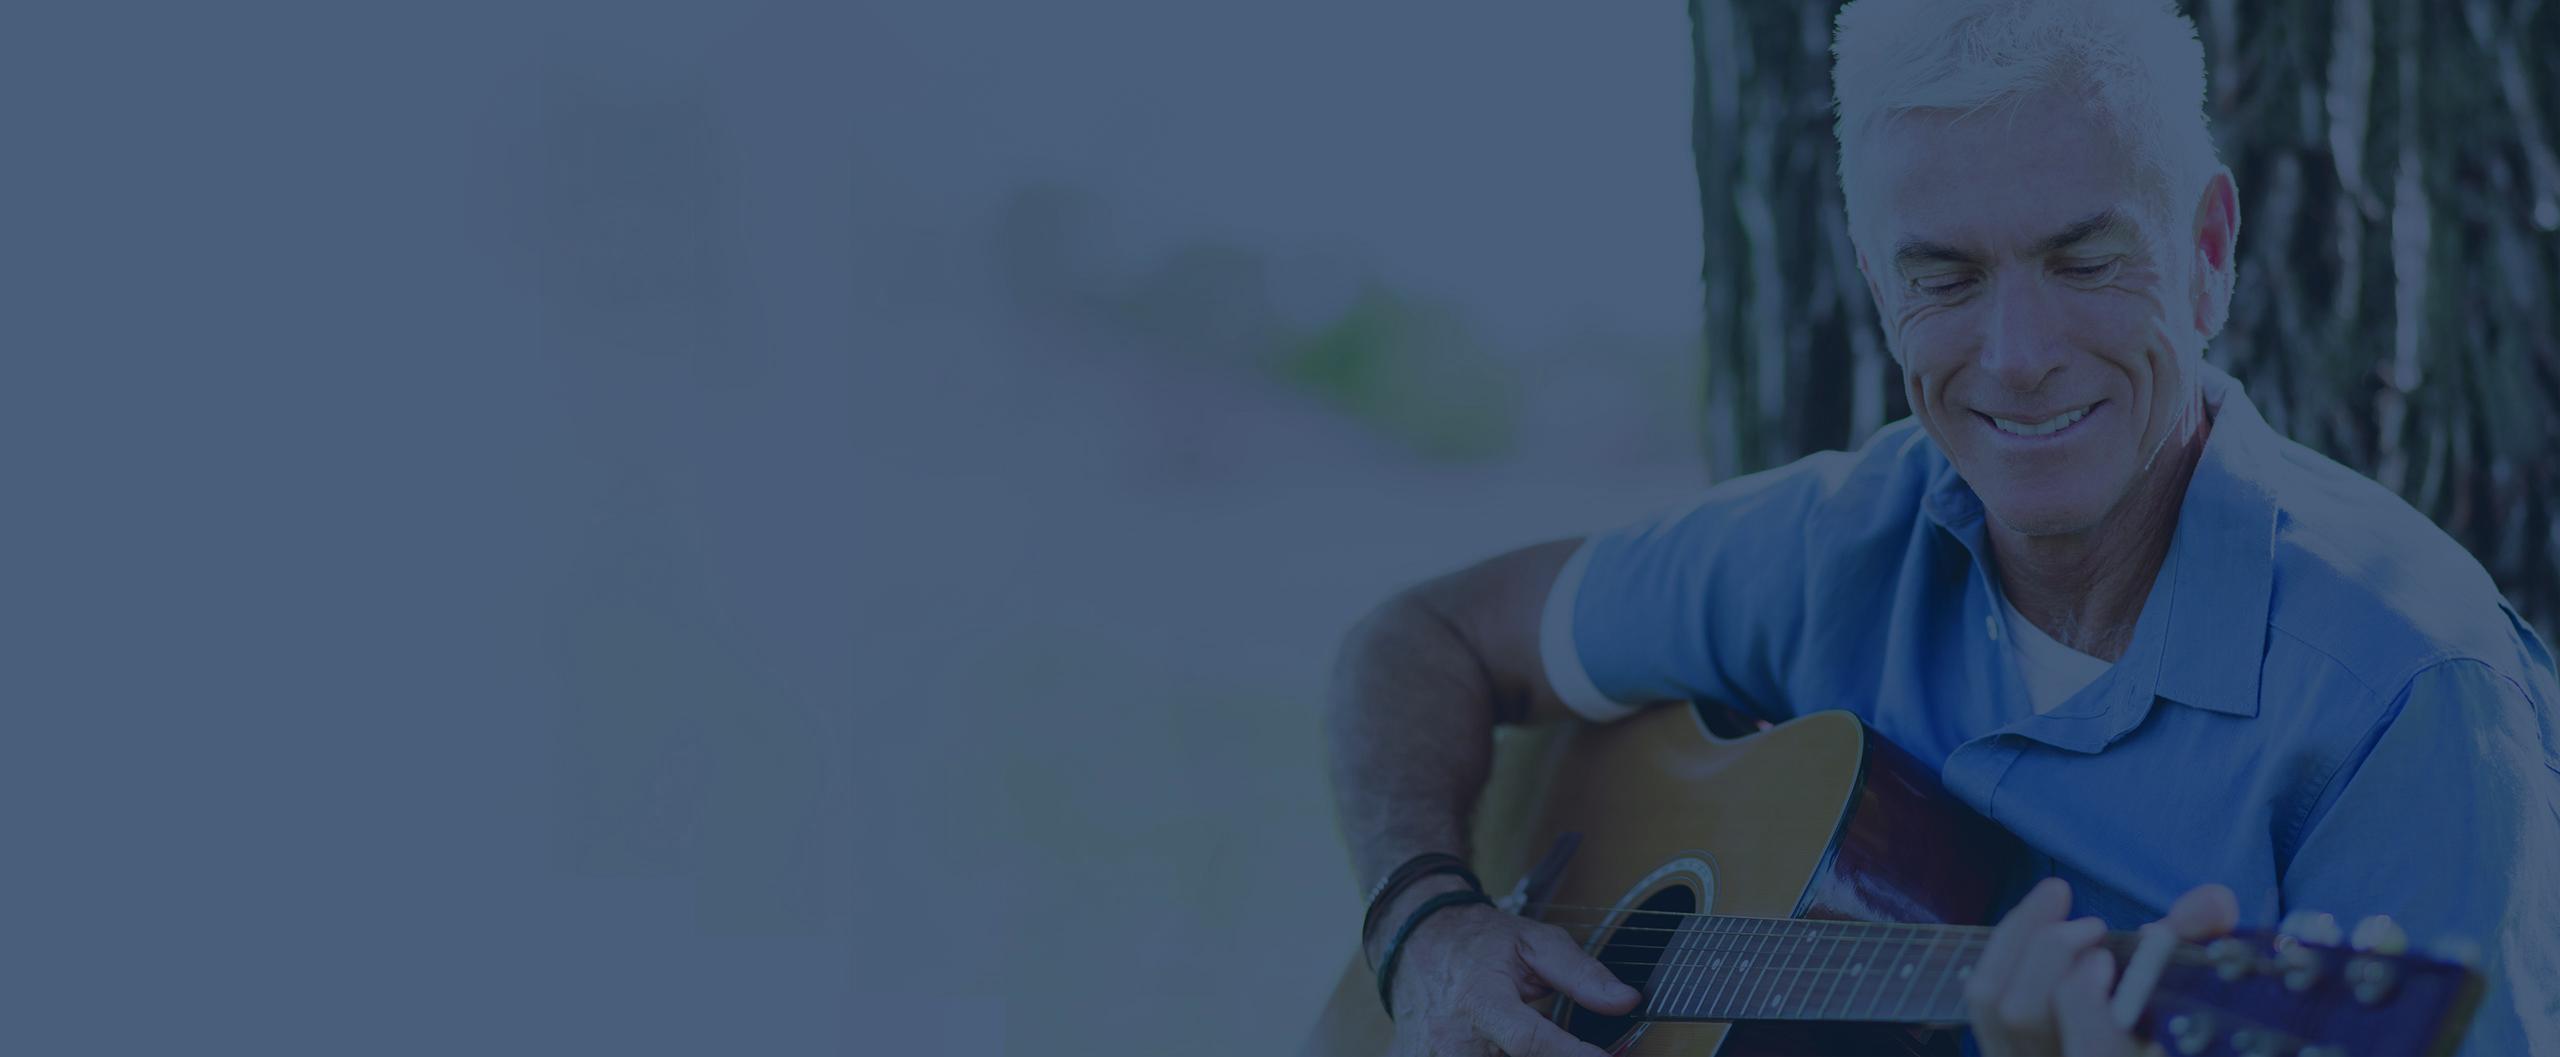 man playing guitar outside